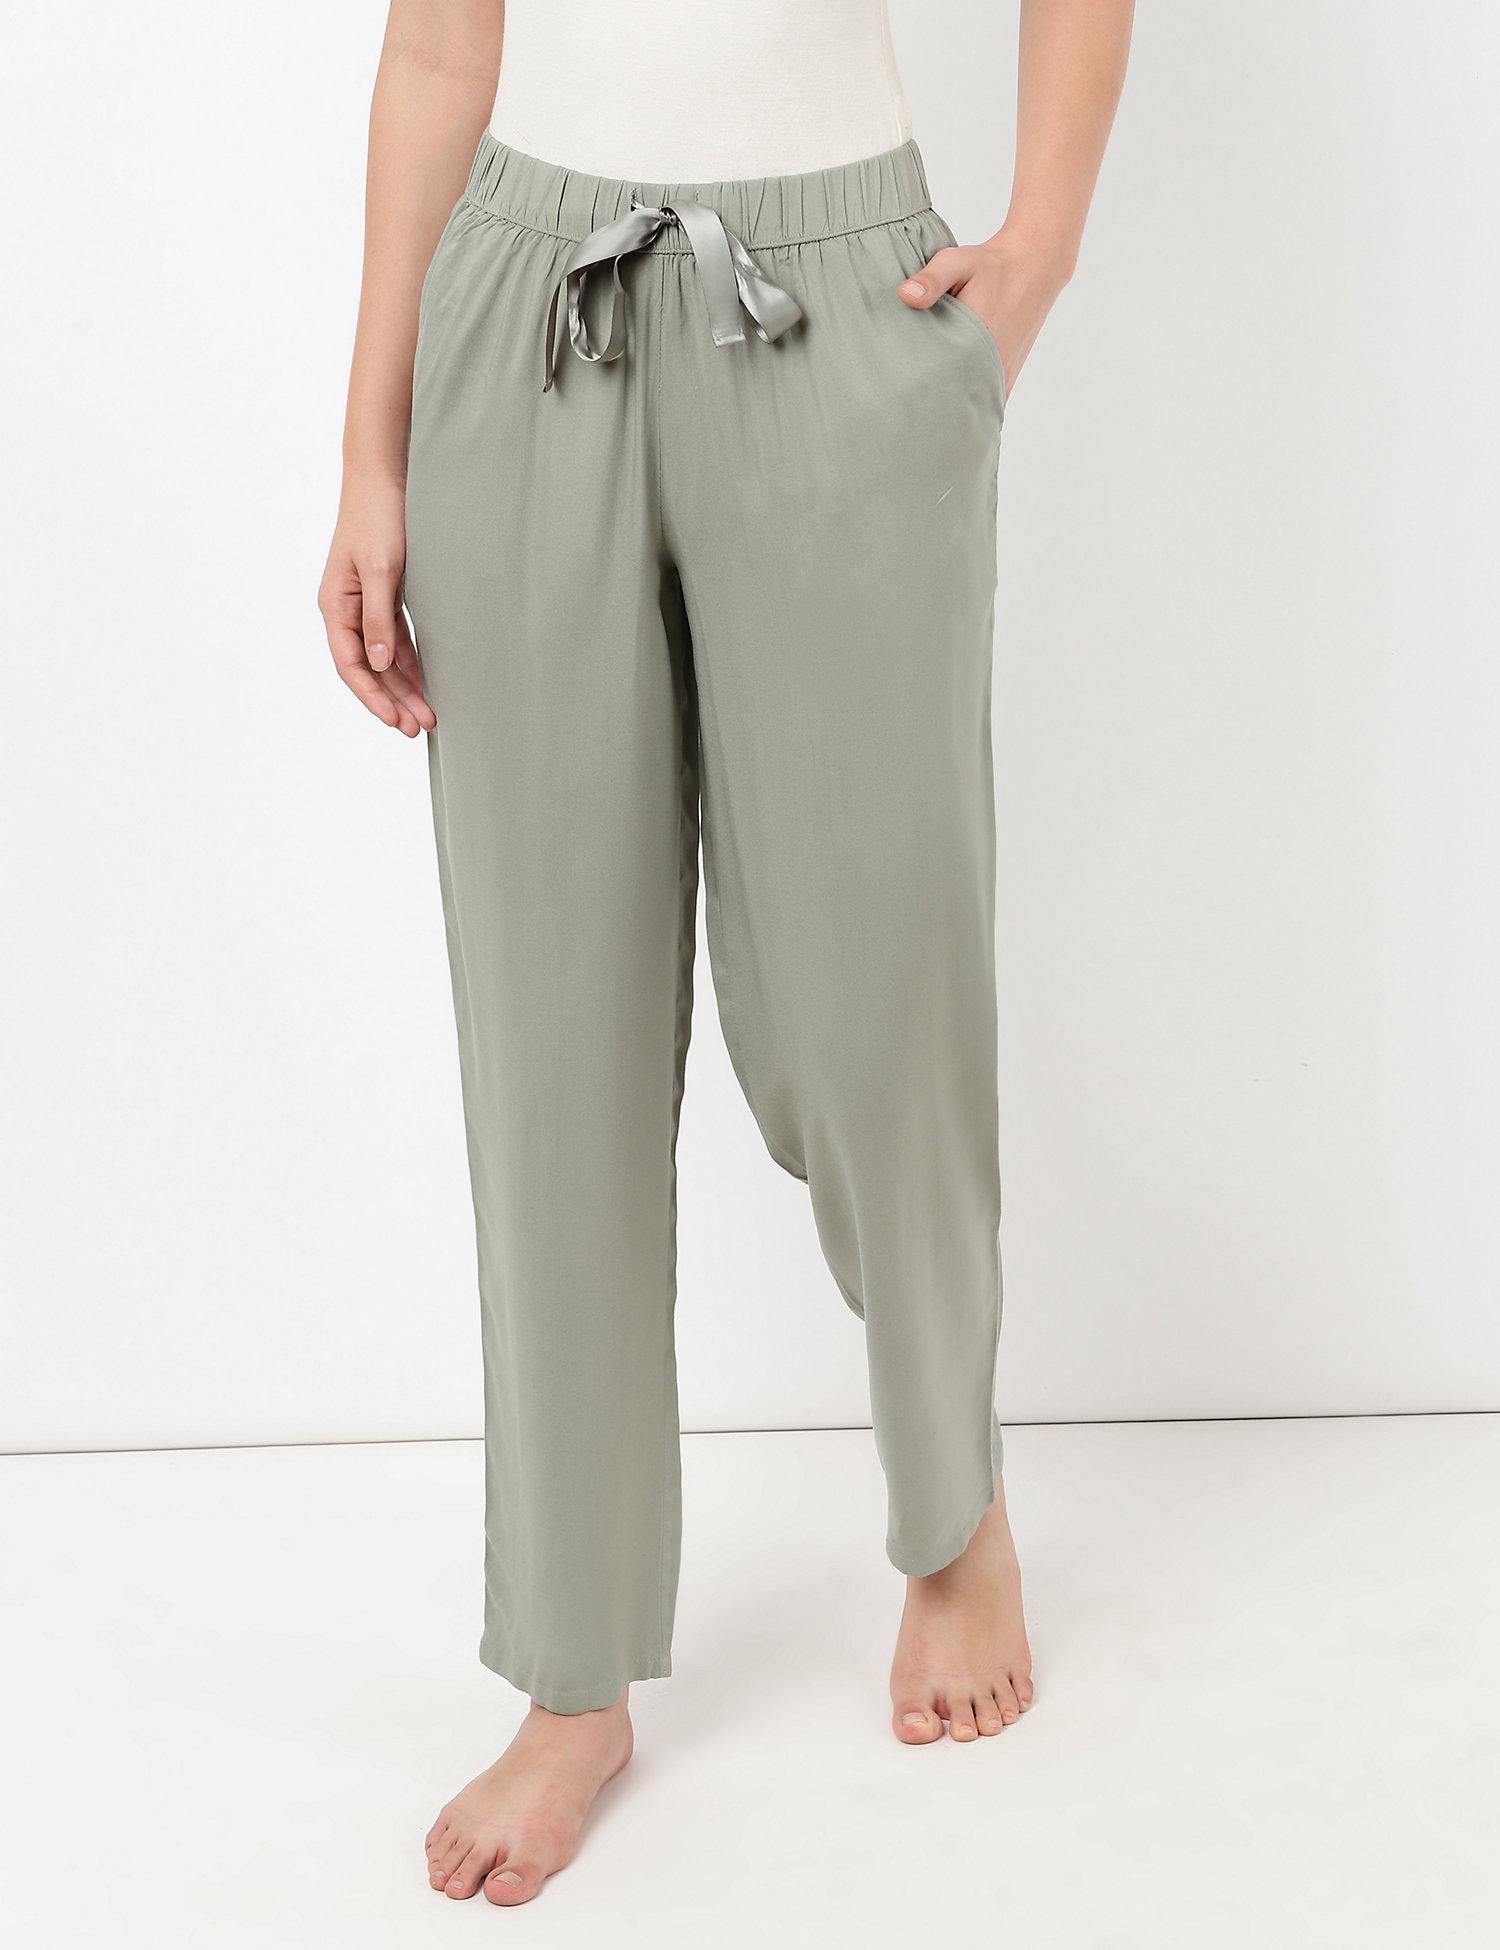 M&S Tapered Leg Solid Pyjama